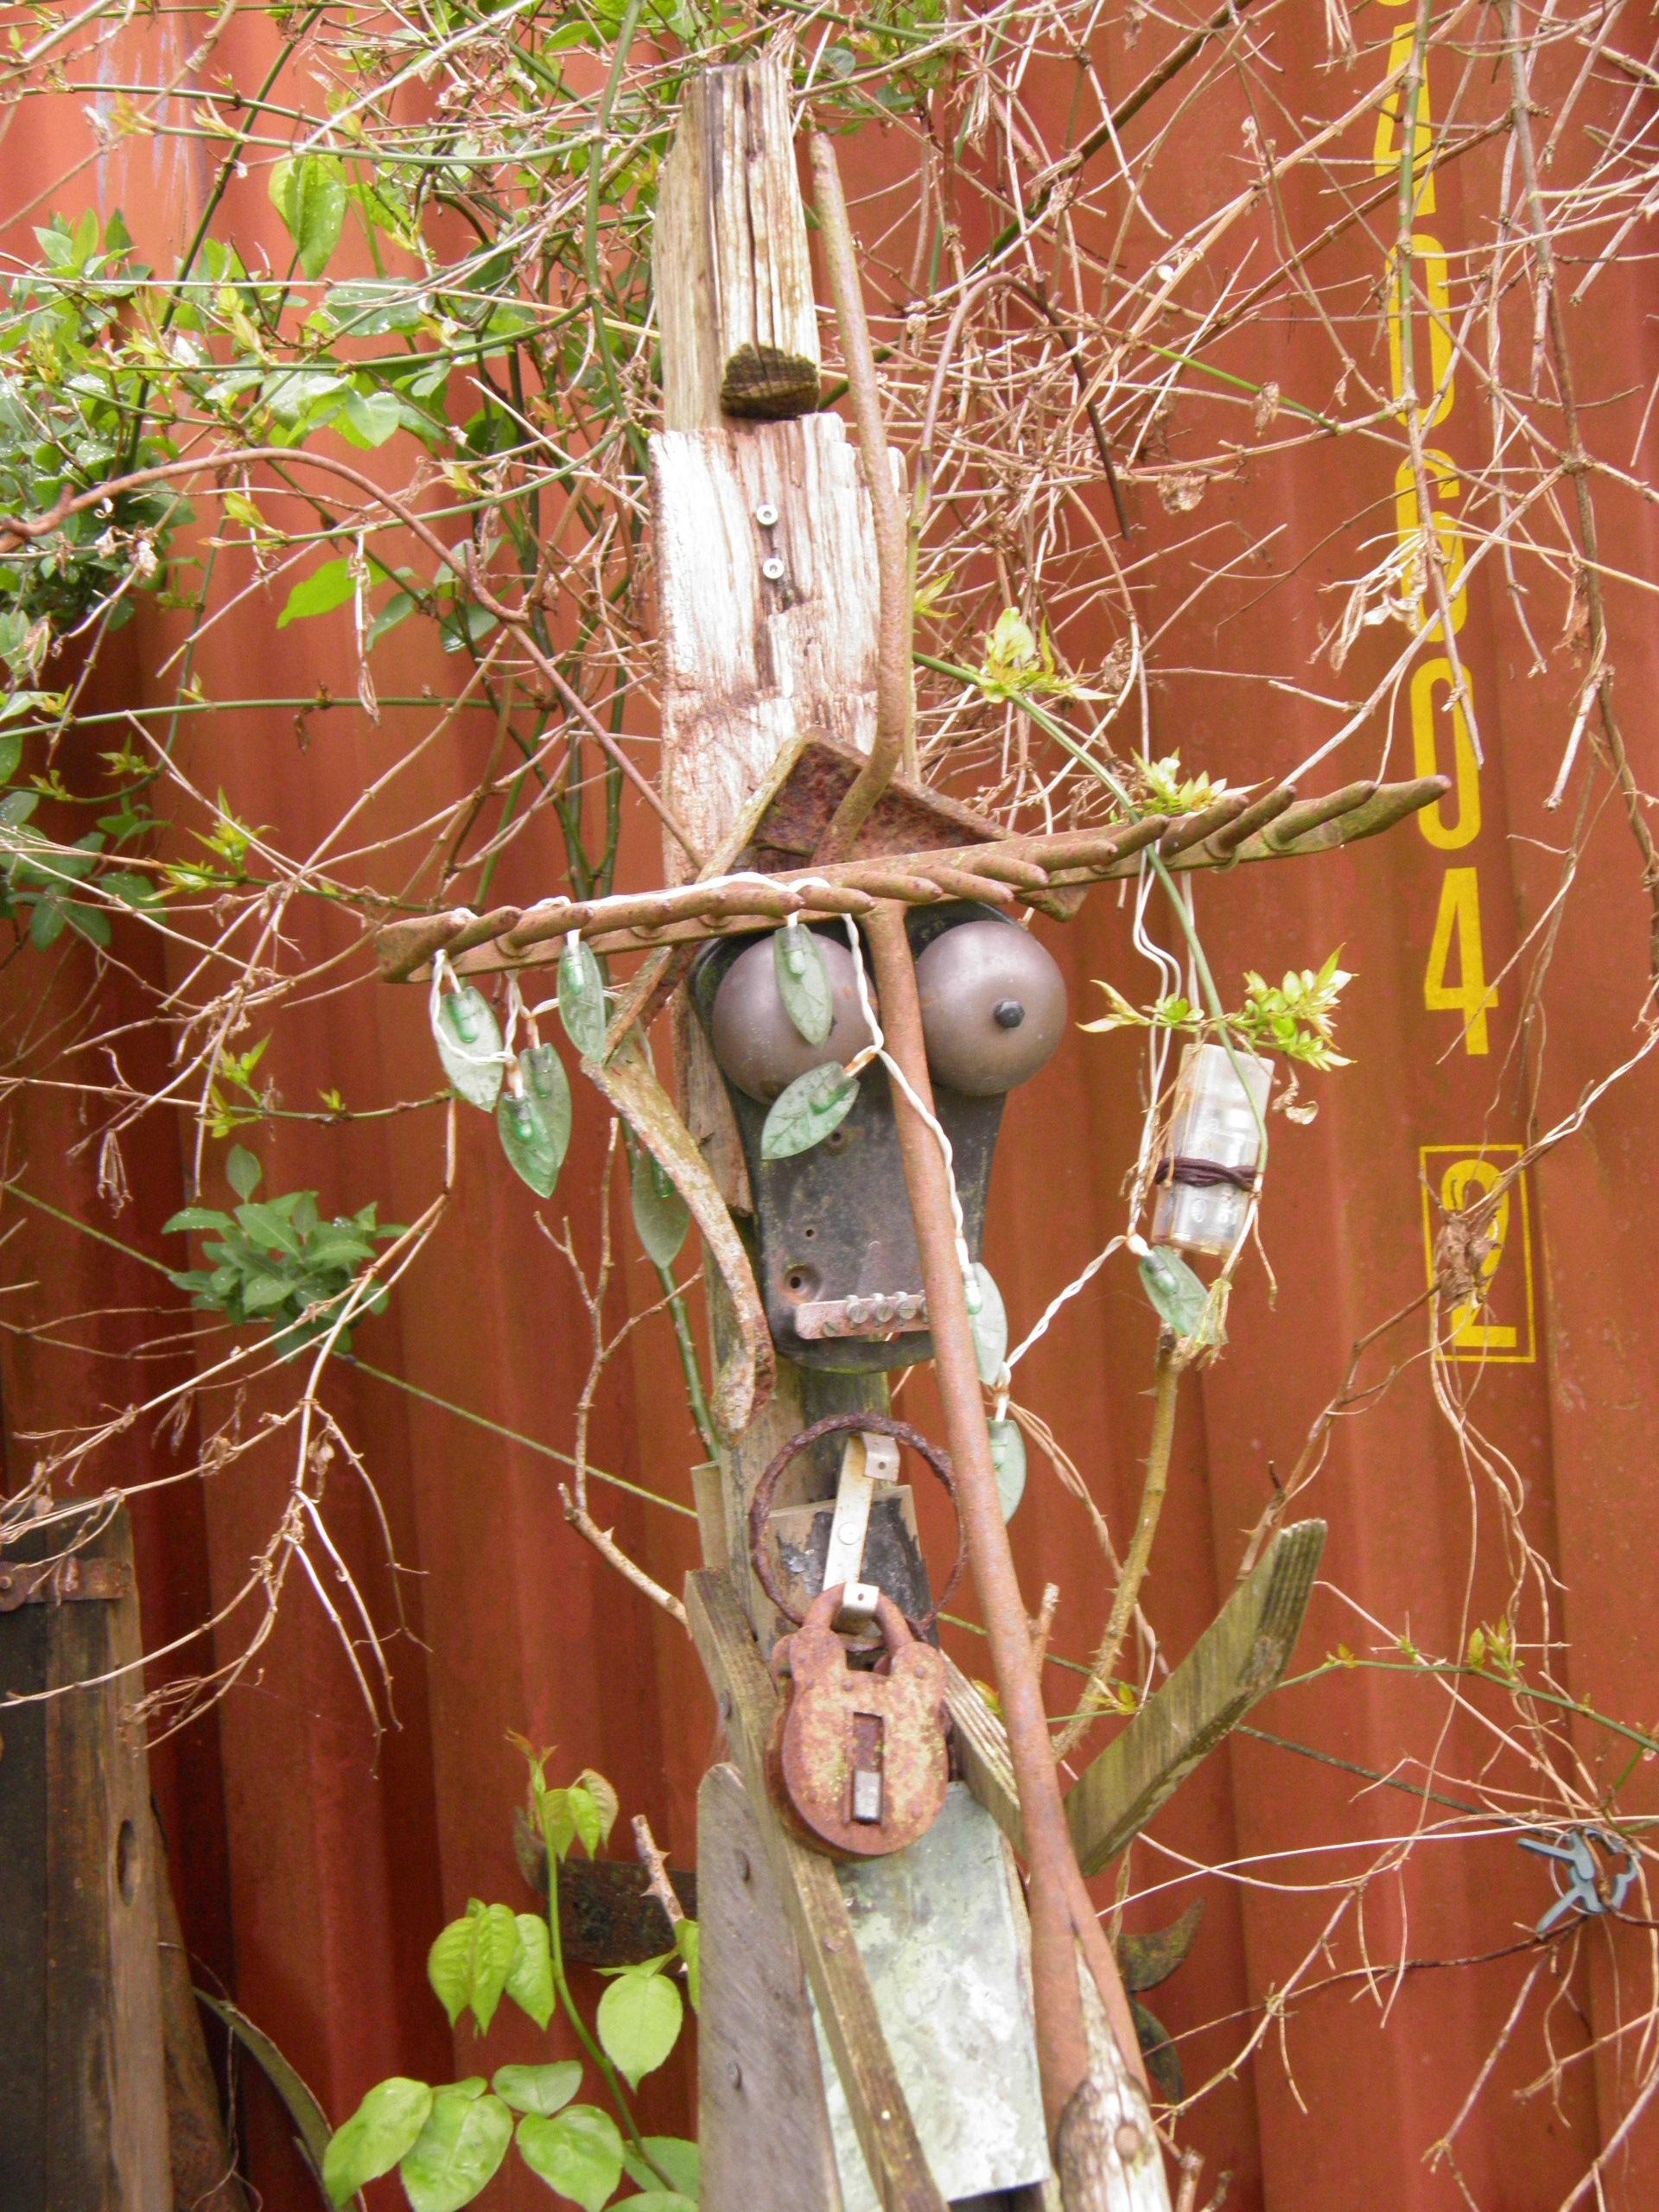 Free Images : tree, branch, creative, leaf, flower, old, spring ...